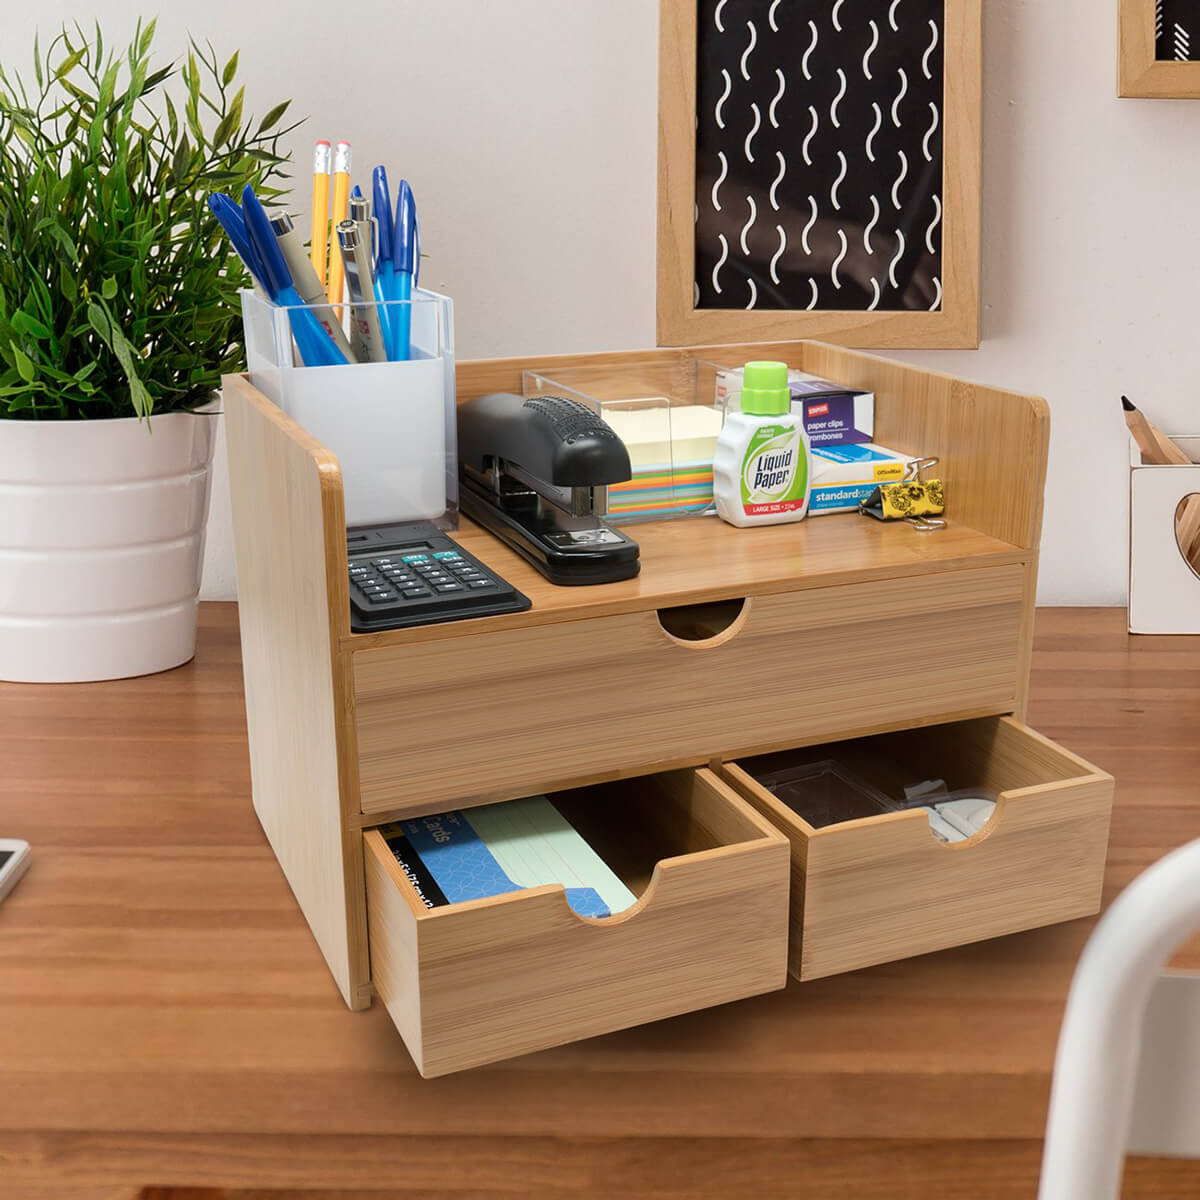 Utilitarian 3-Tier Bamboo Shelf Organizer